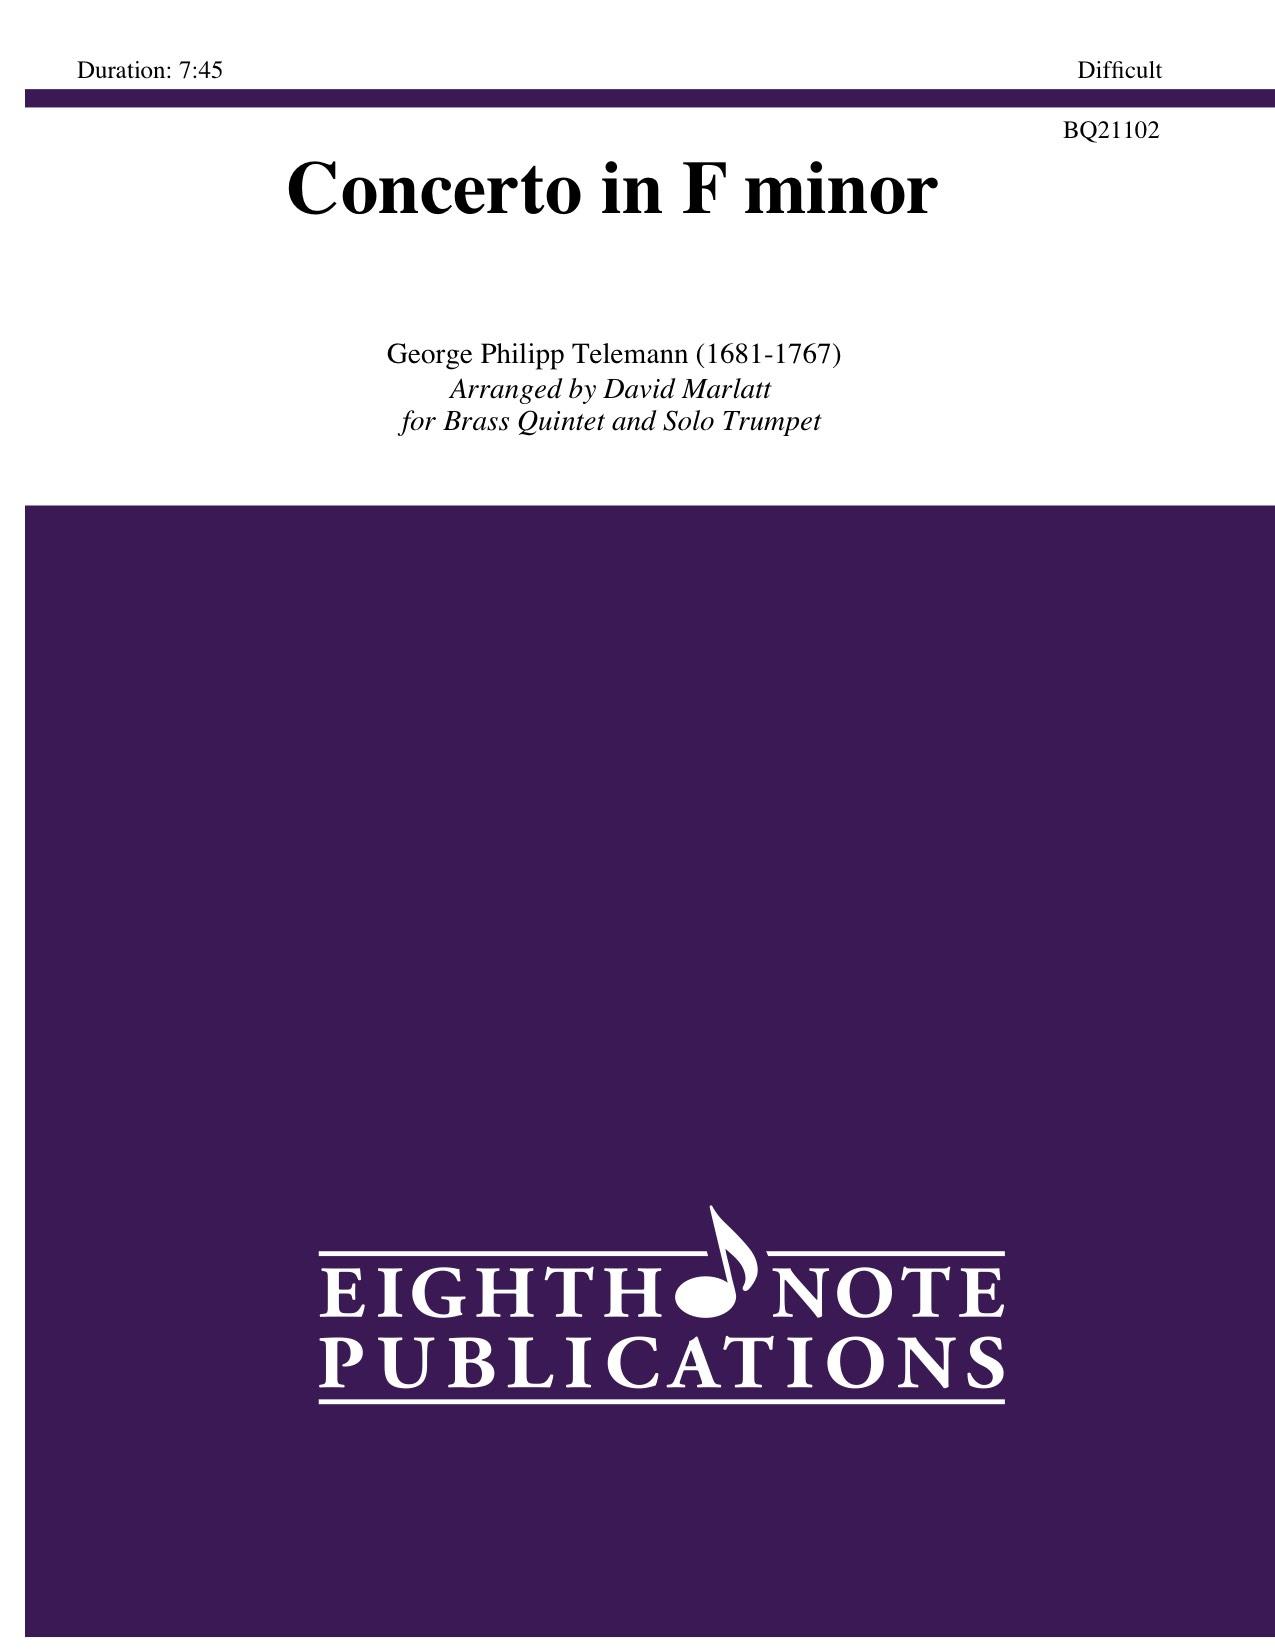 Concerto in F minor - George Philipp Telemann